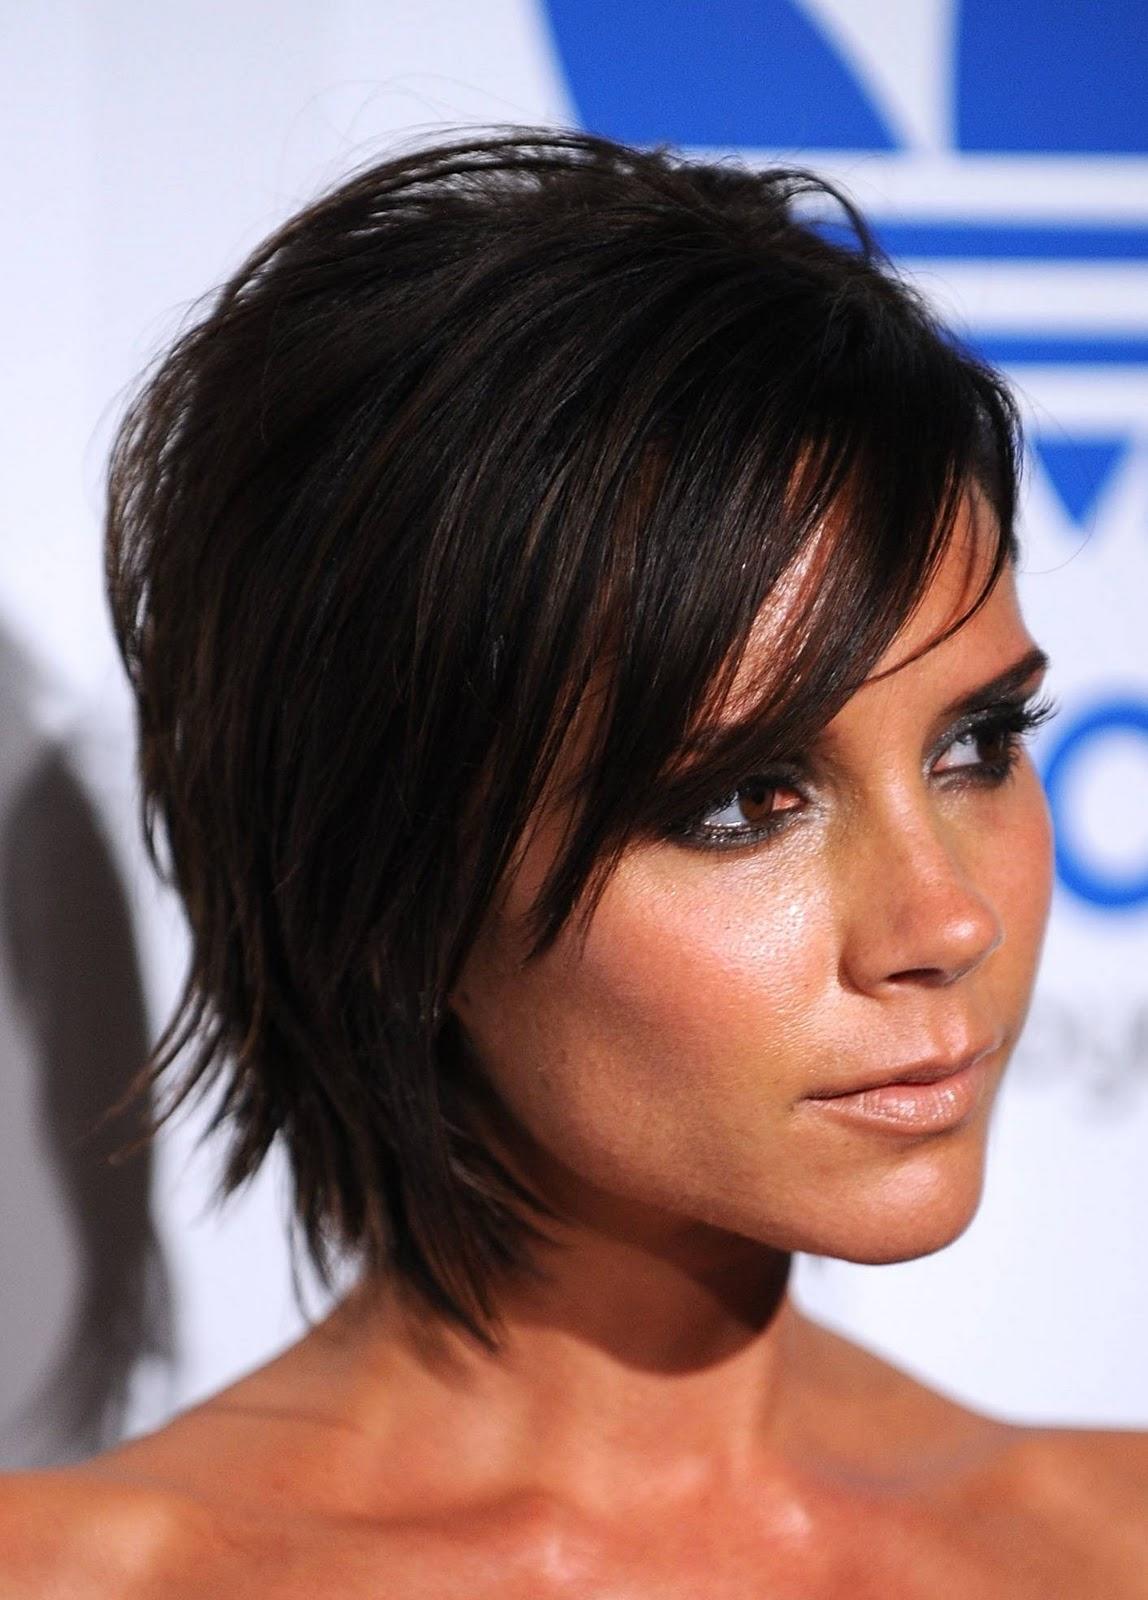 Mila Kunis Sexy: Bob Hairstyles